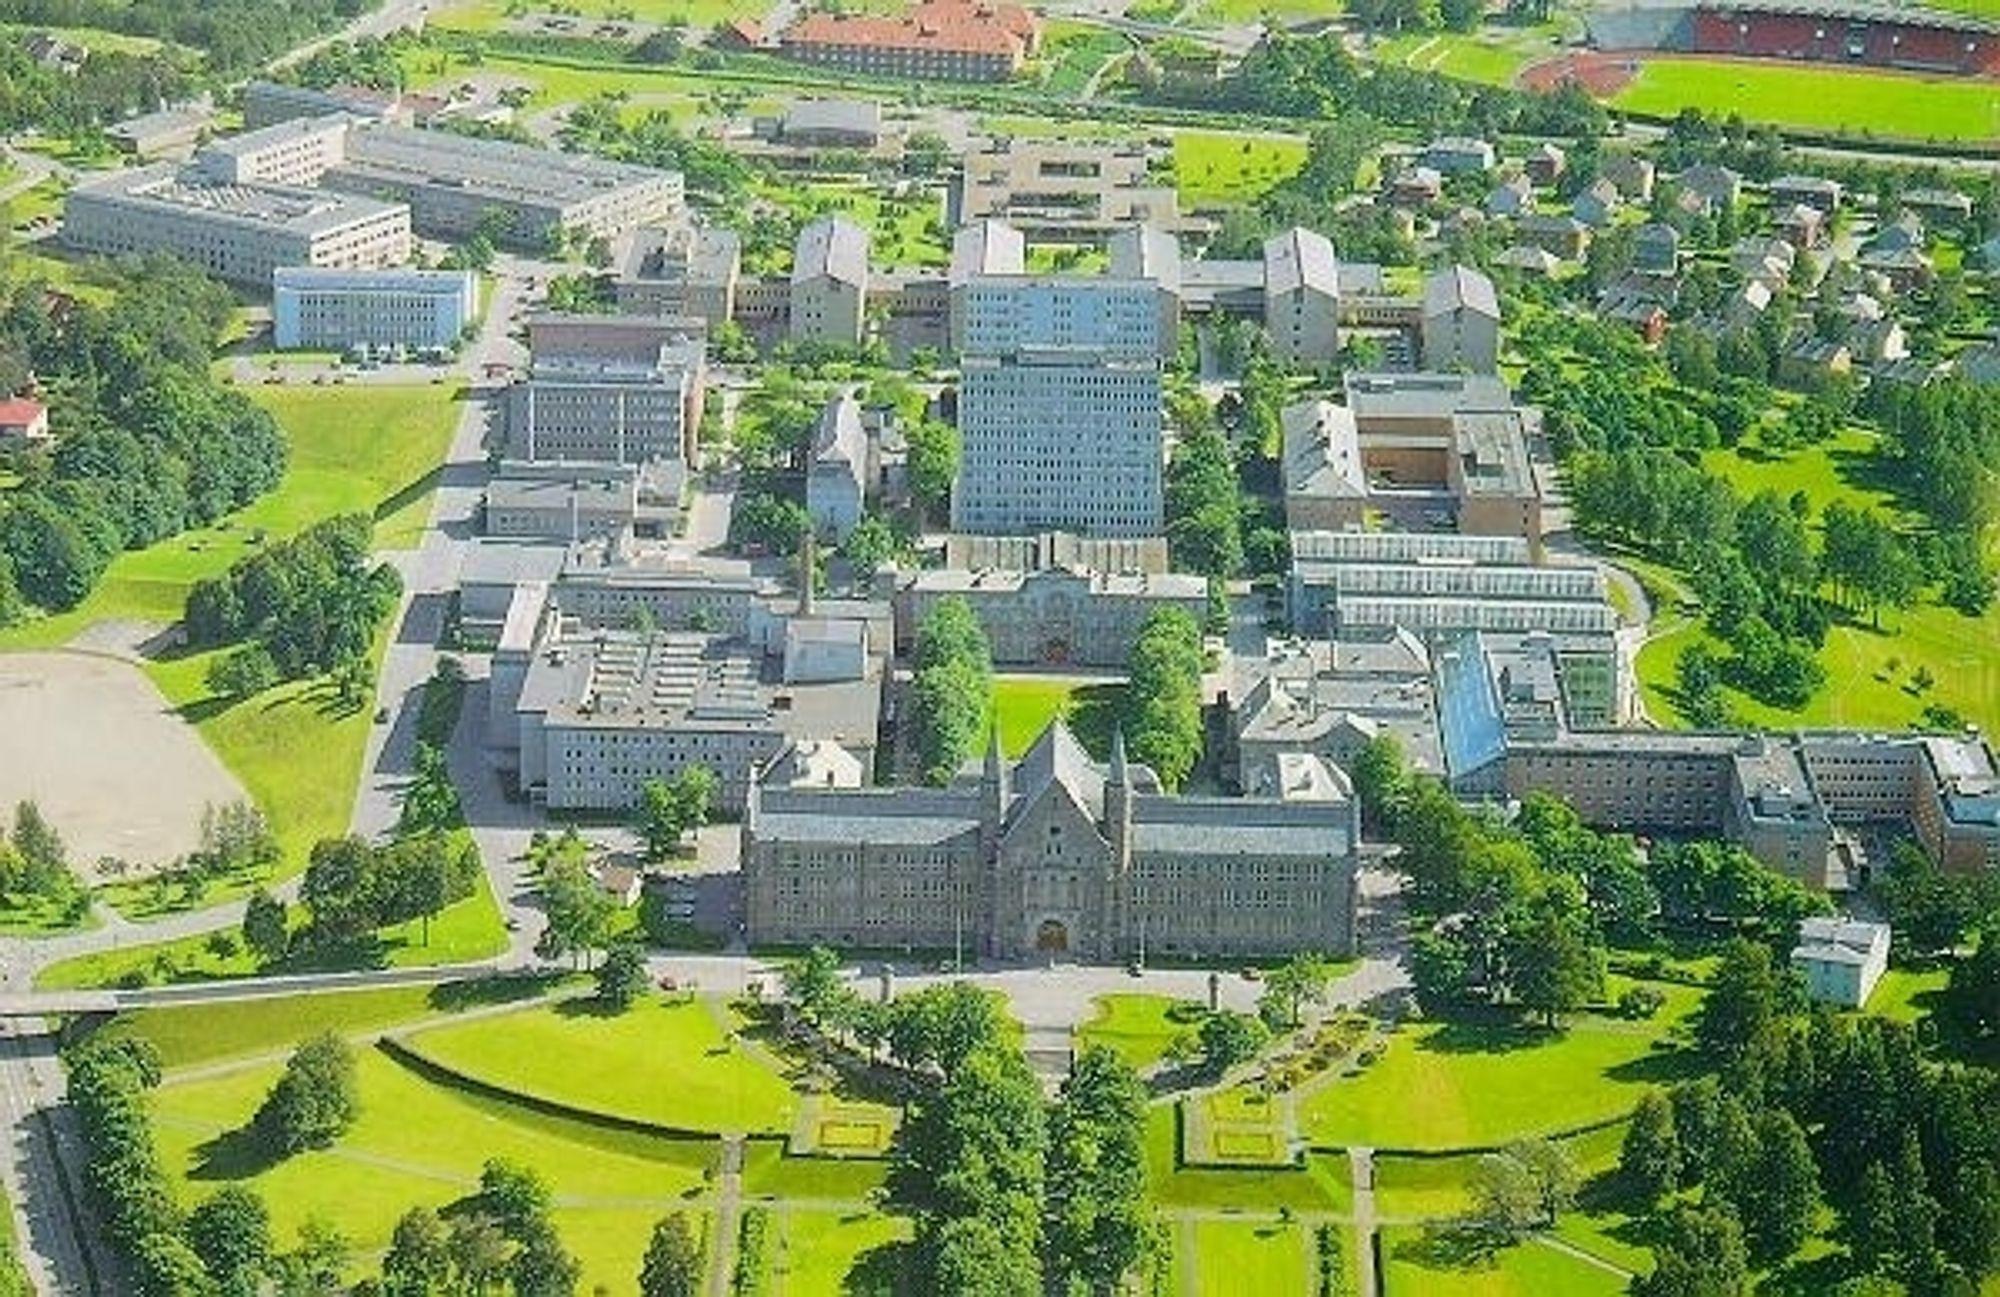 NTNU Gløshaugen. Universitet. Studier. Studere. Student. Sivilingeniør. Teknolog. Teknologi.